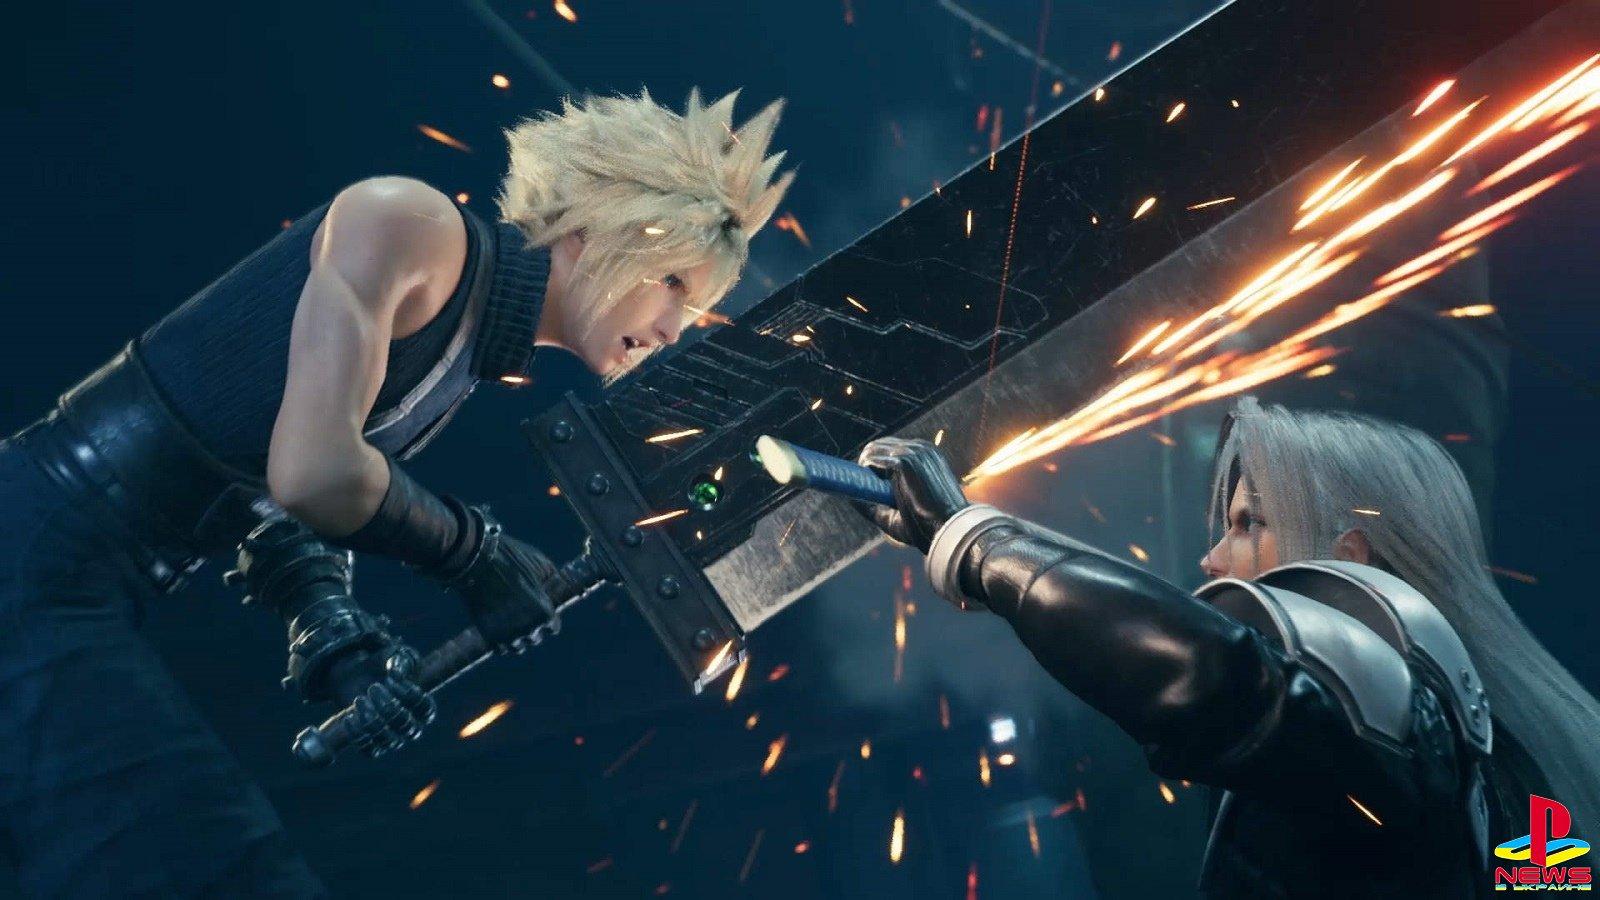 Final Fantasy VII Remake установила рекорд среди эксклюзивов PlayStation